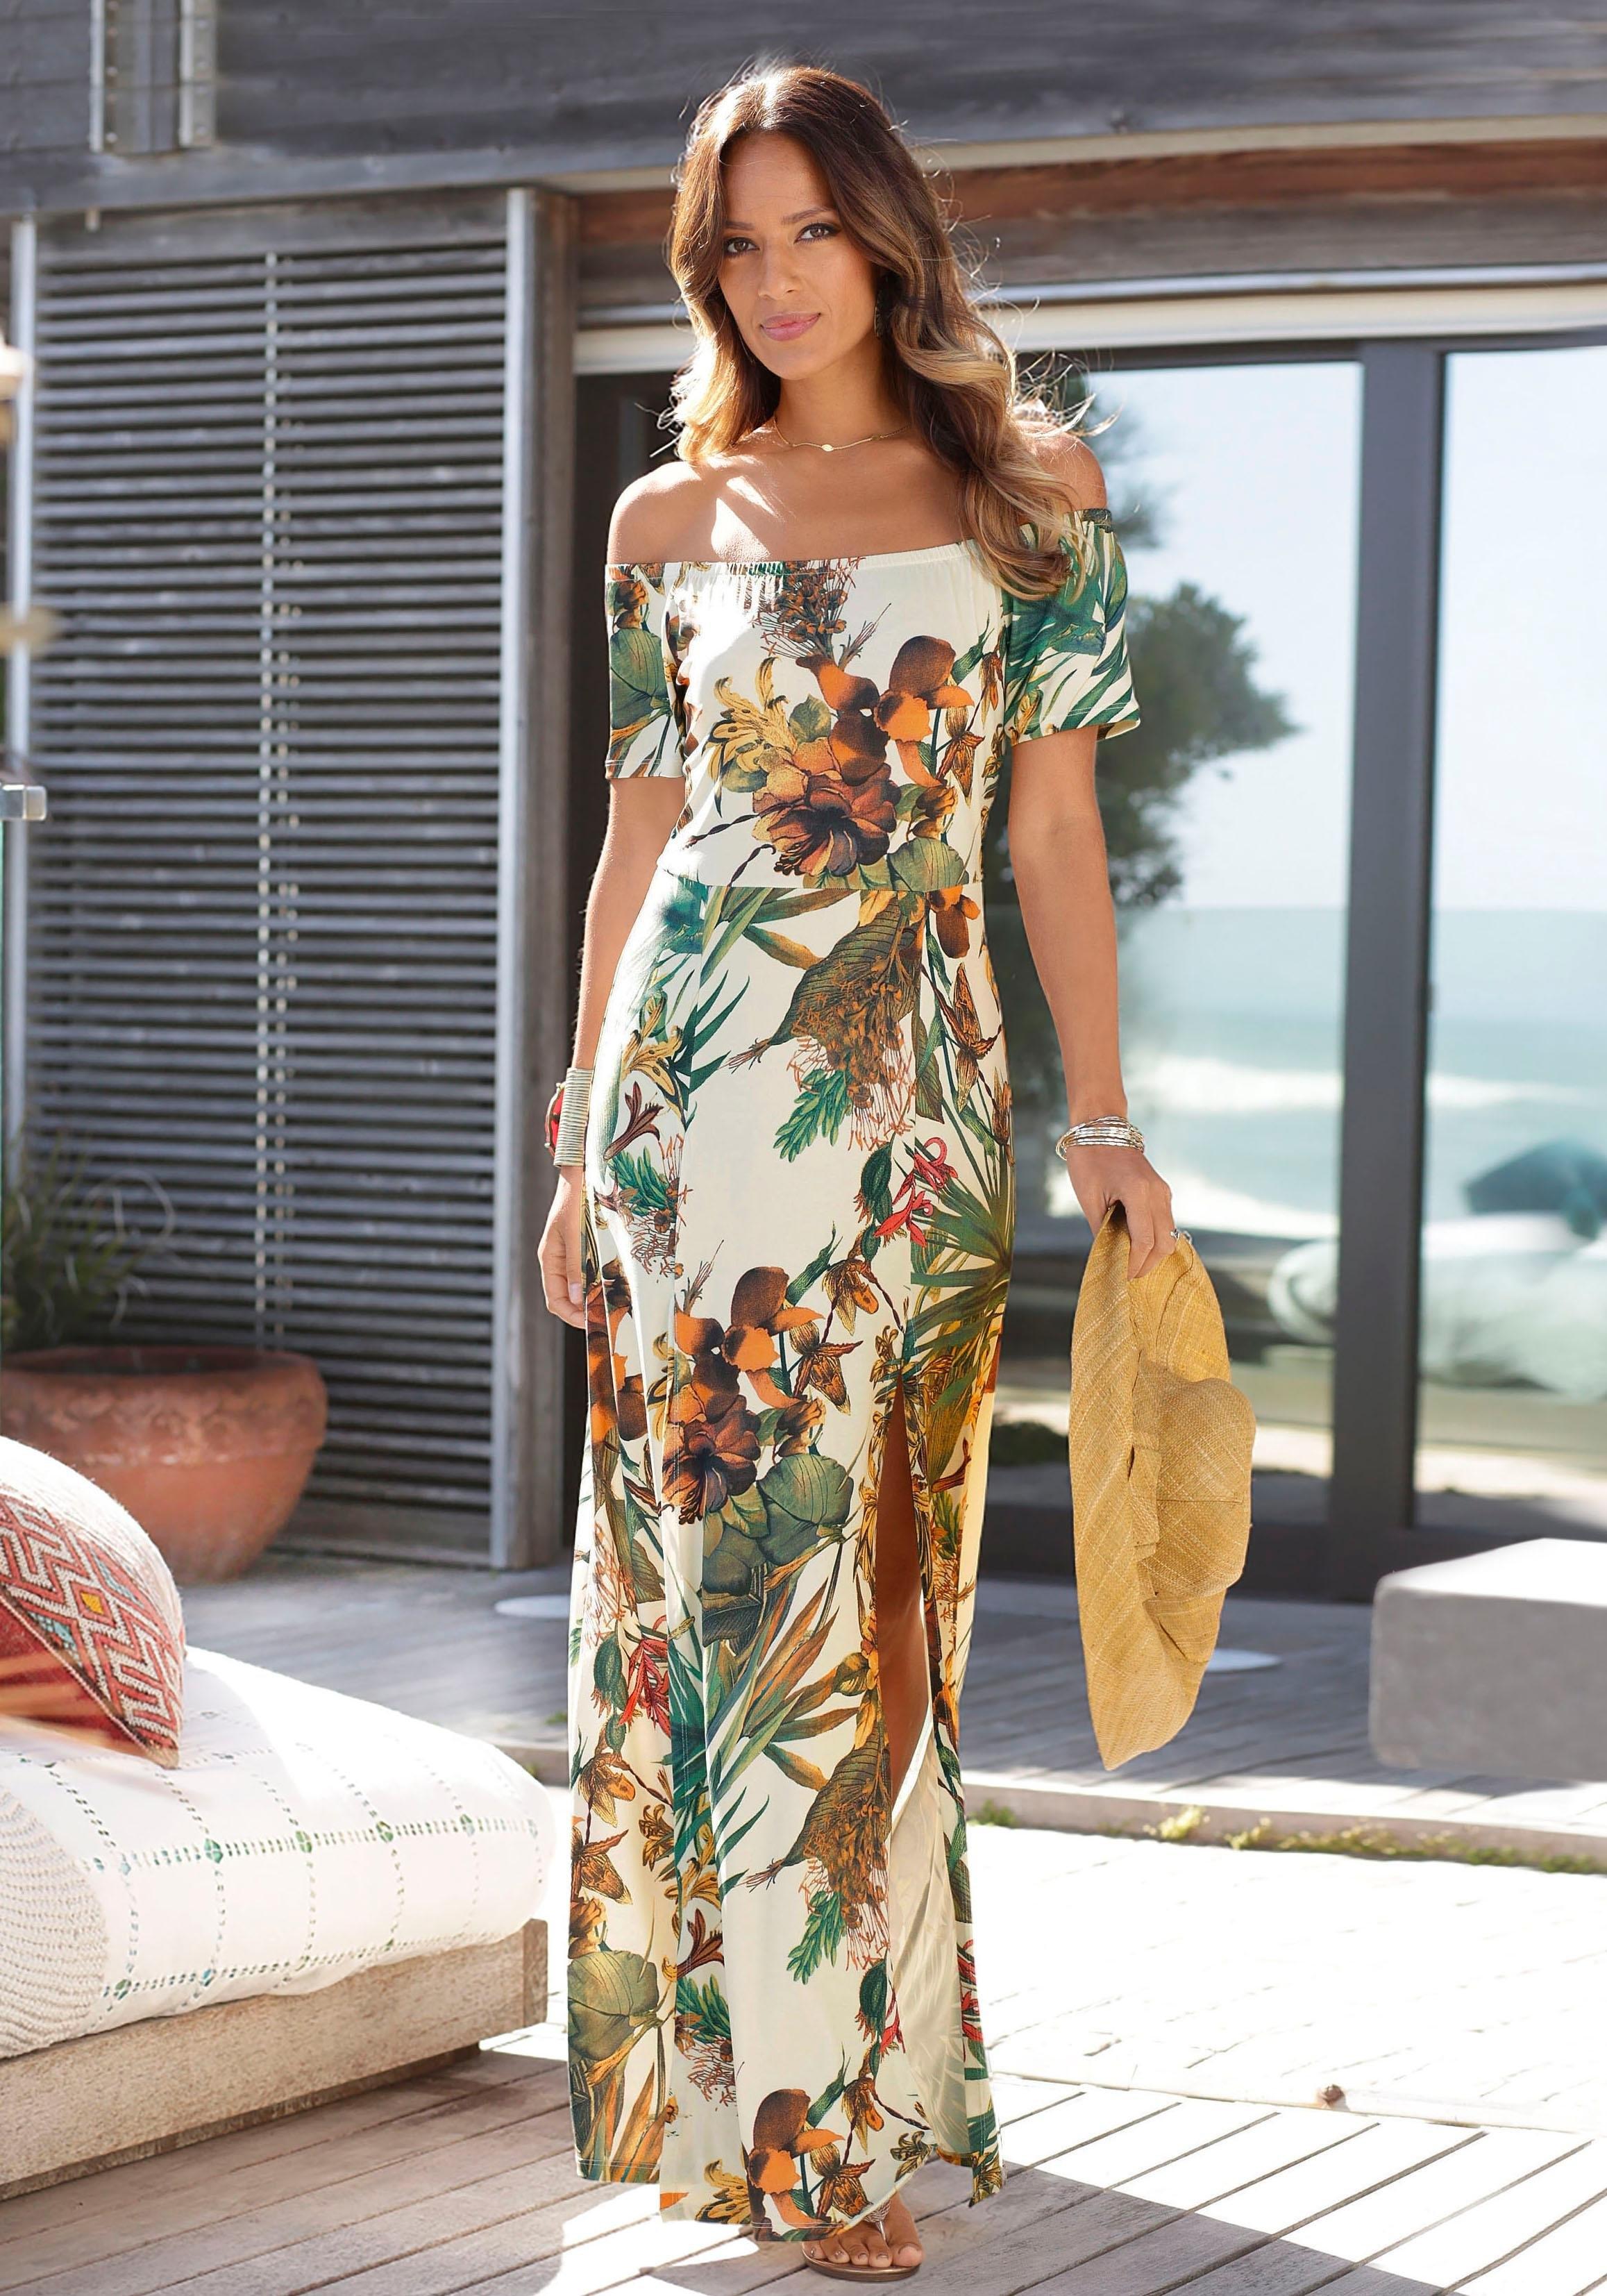 ed93c8dfe847e7 Maxi-jurk online kopen  Ruim 388 trendy en stijlvolle maxi-jurken